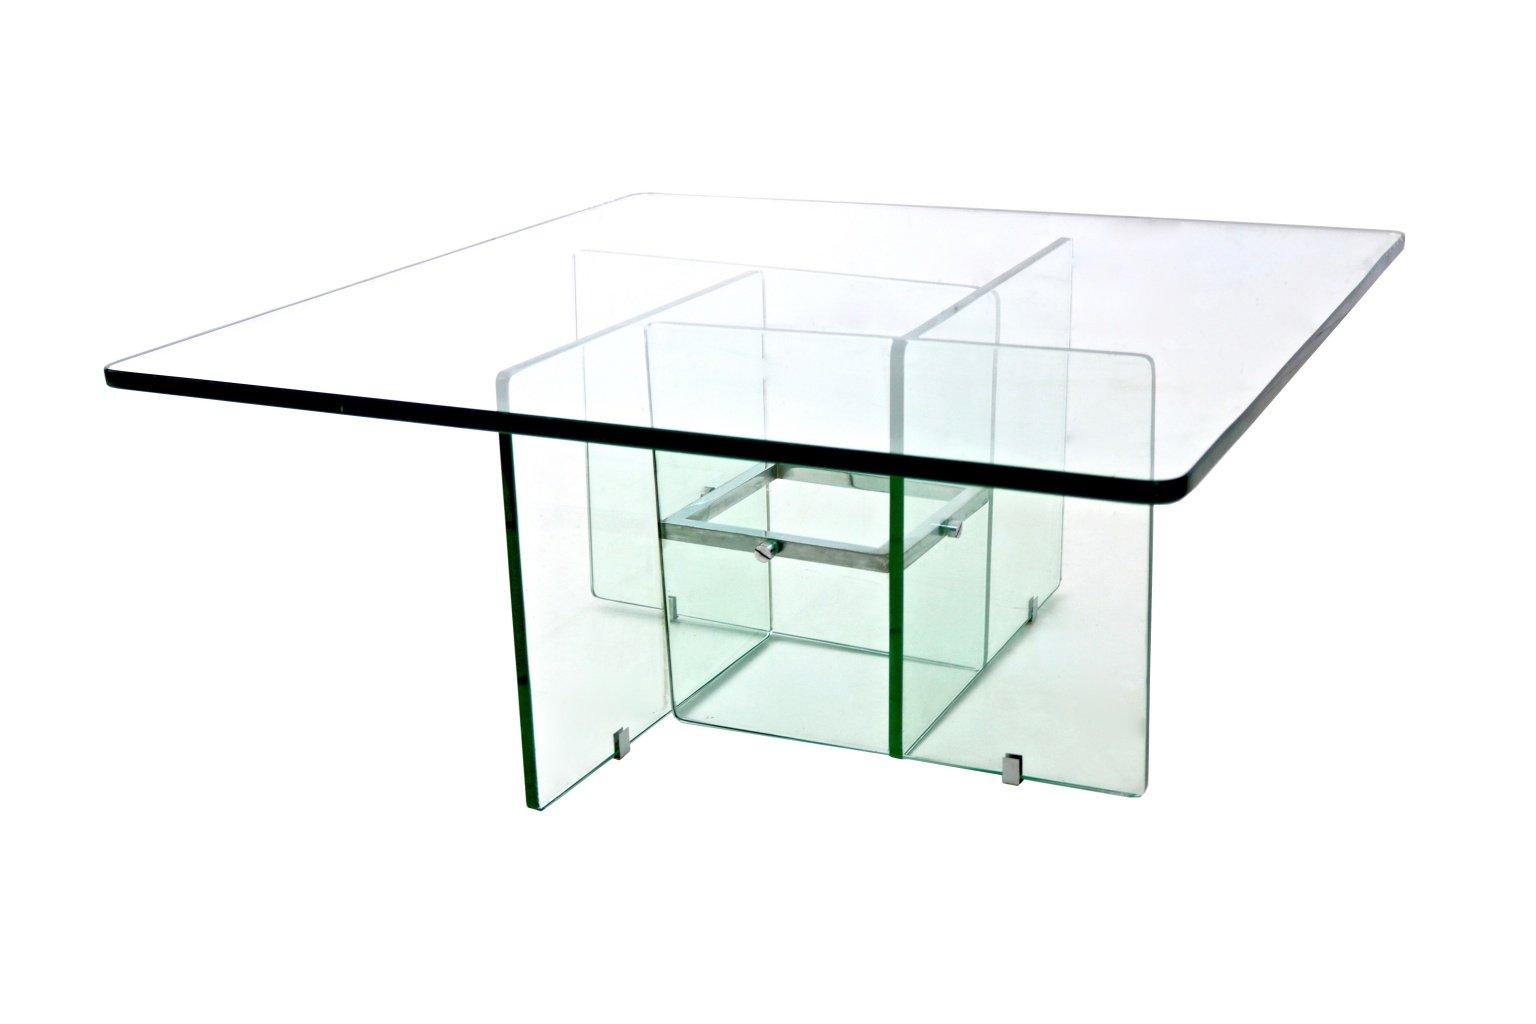 Aquamarine Square Glass Coffee Table, 1970s 7. $1,654.00. Price Per Piece